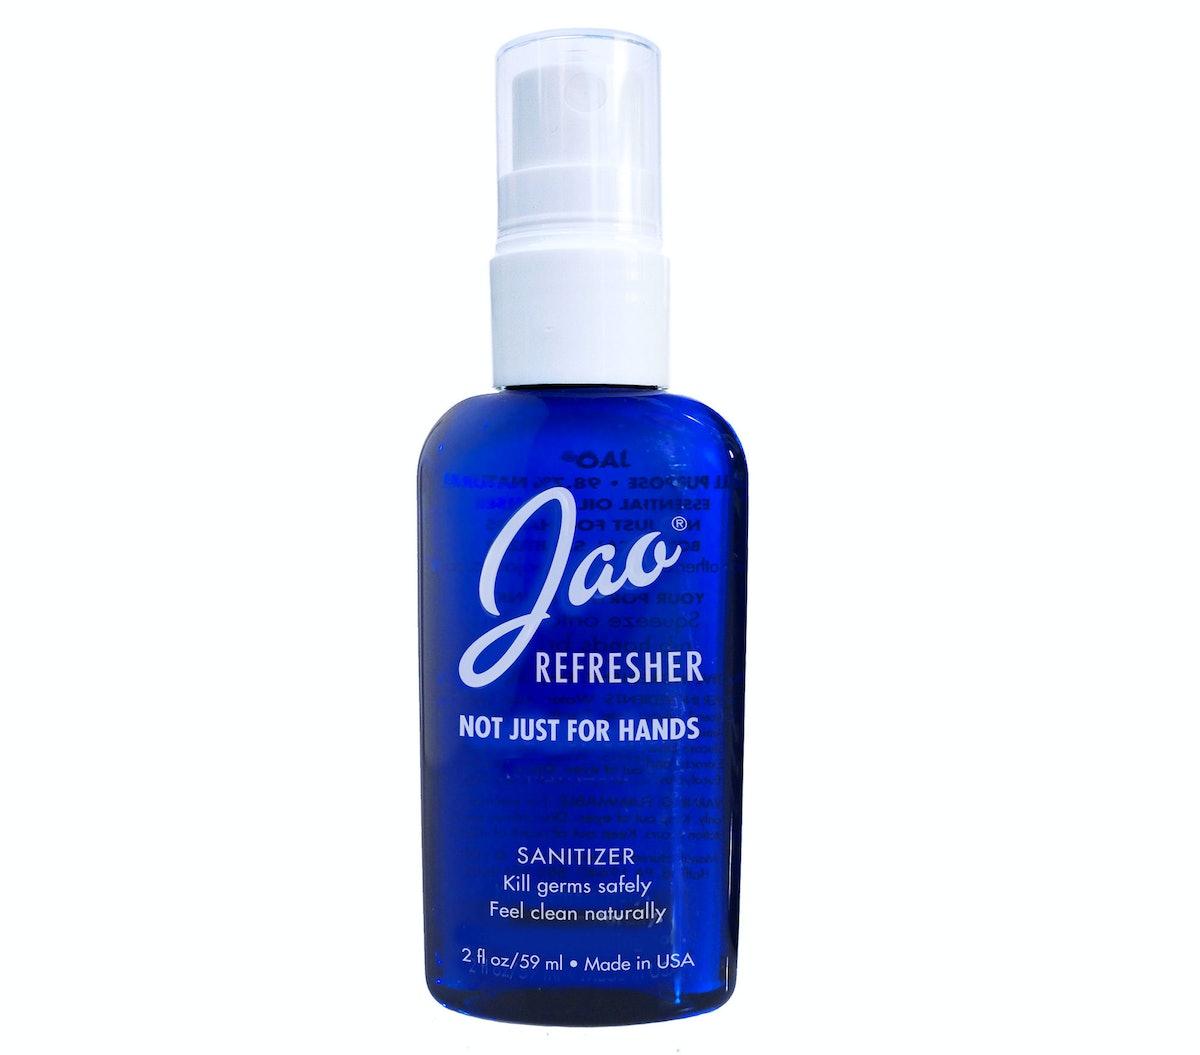 Jao Refresher